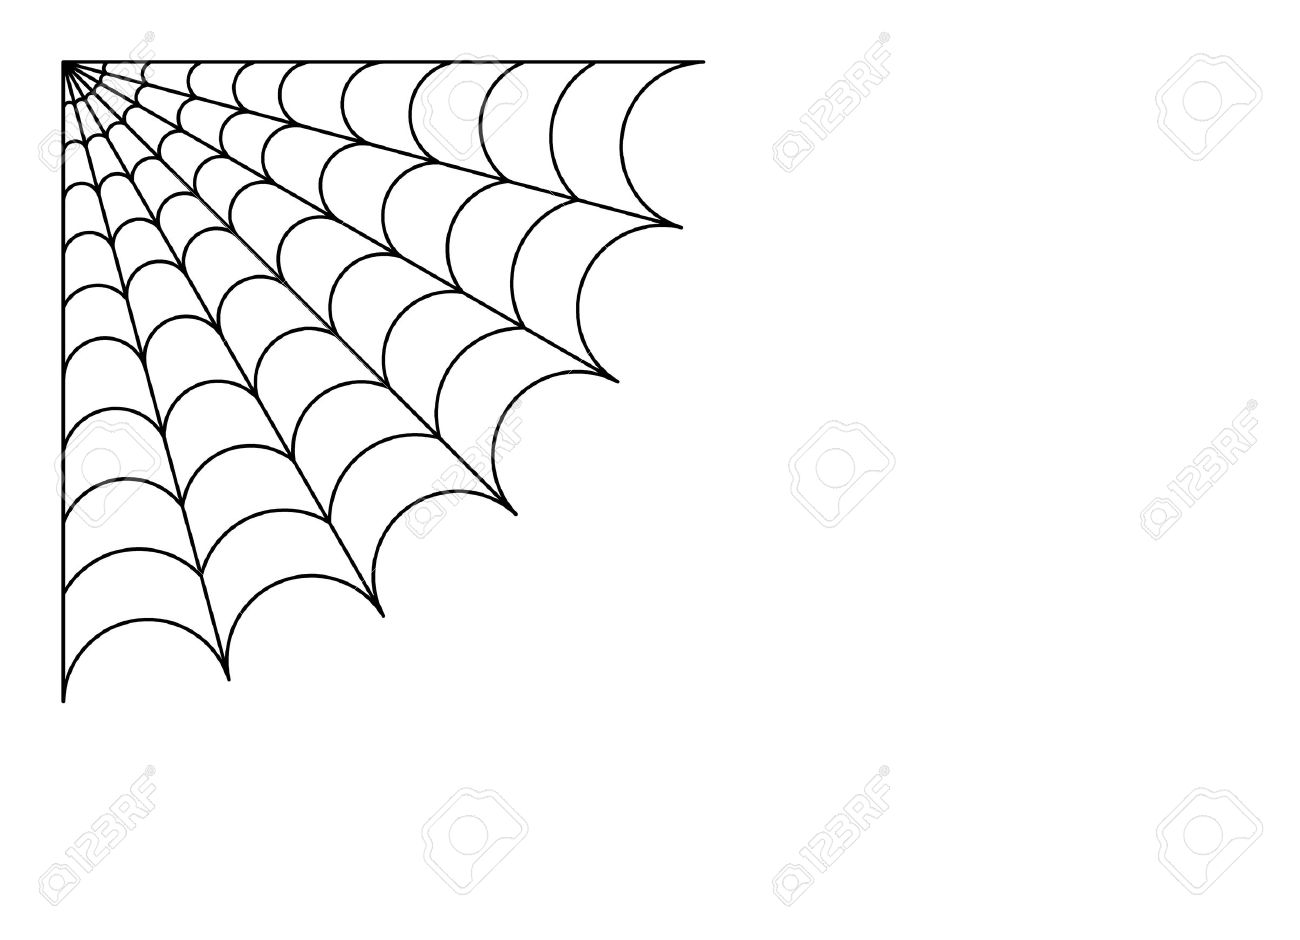 Spider web Stock Photo - 11571598